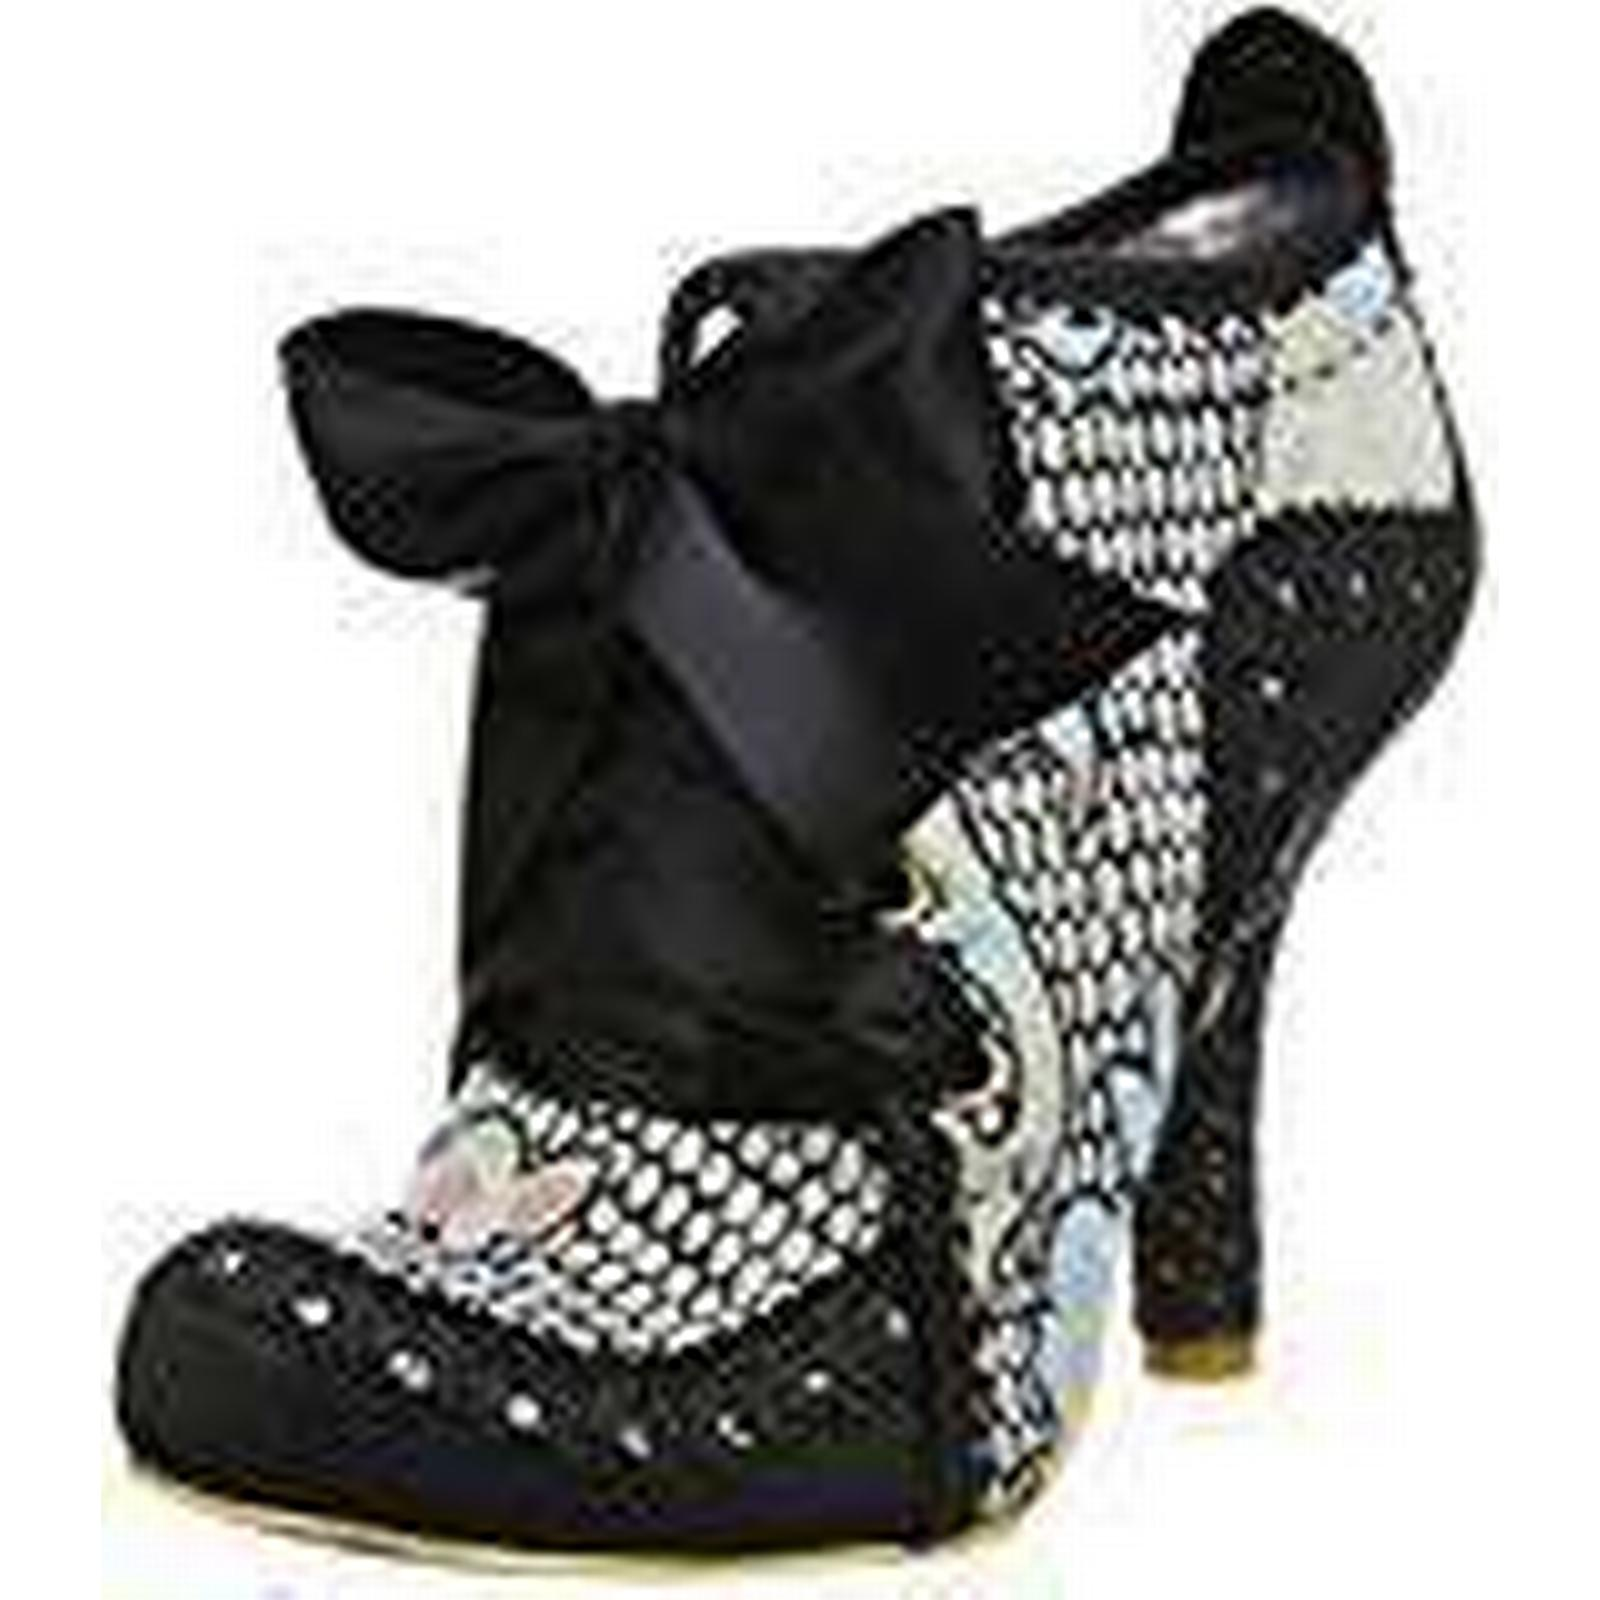 Irregular Choice Women''s Heels, Abigail's Third Party Closed-Toe Heels, Women''s (Black/Pale Blue), 7.5 UK 41 EU e09ab6